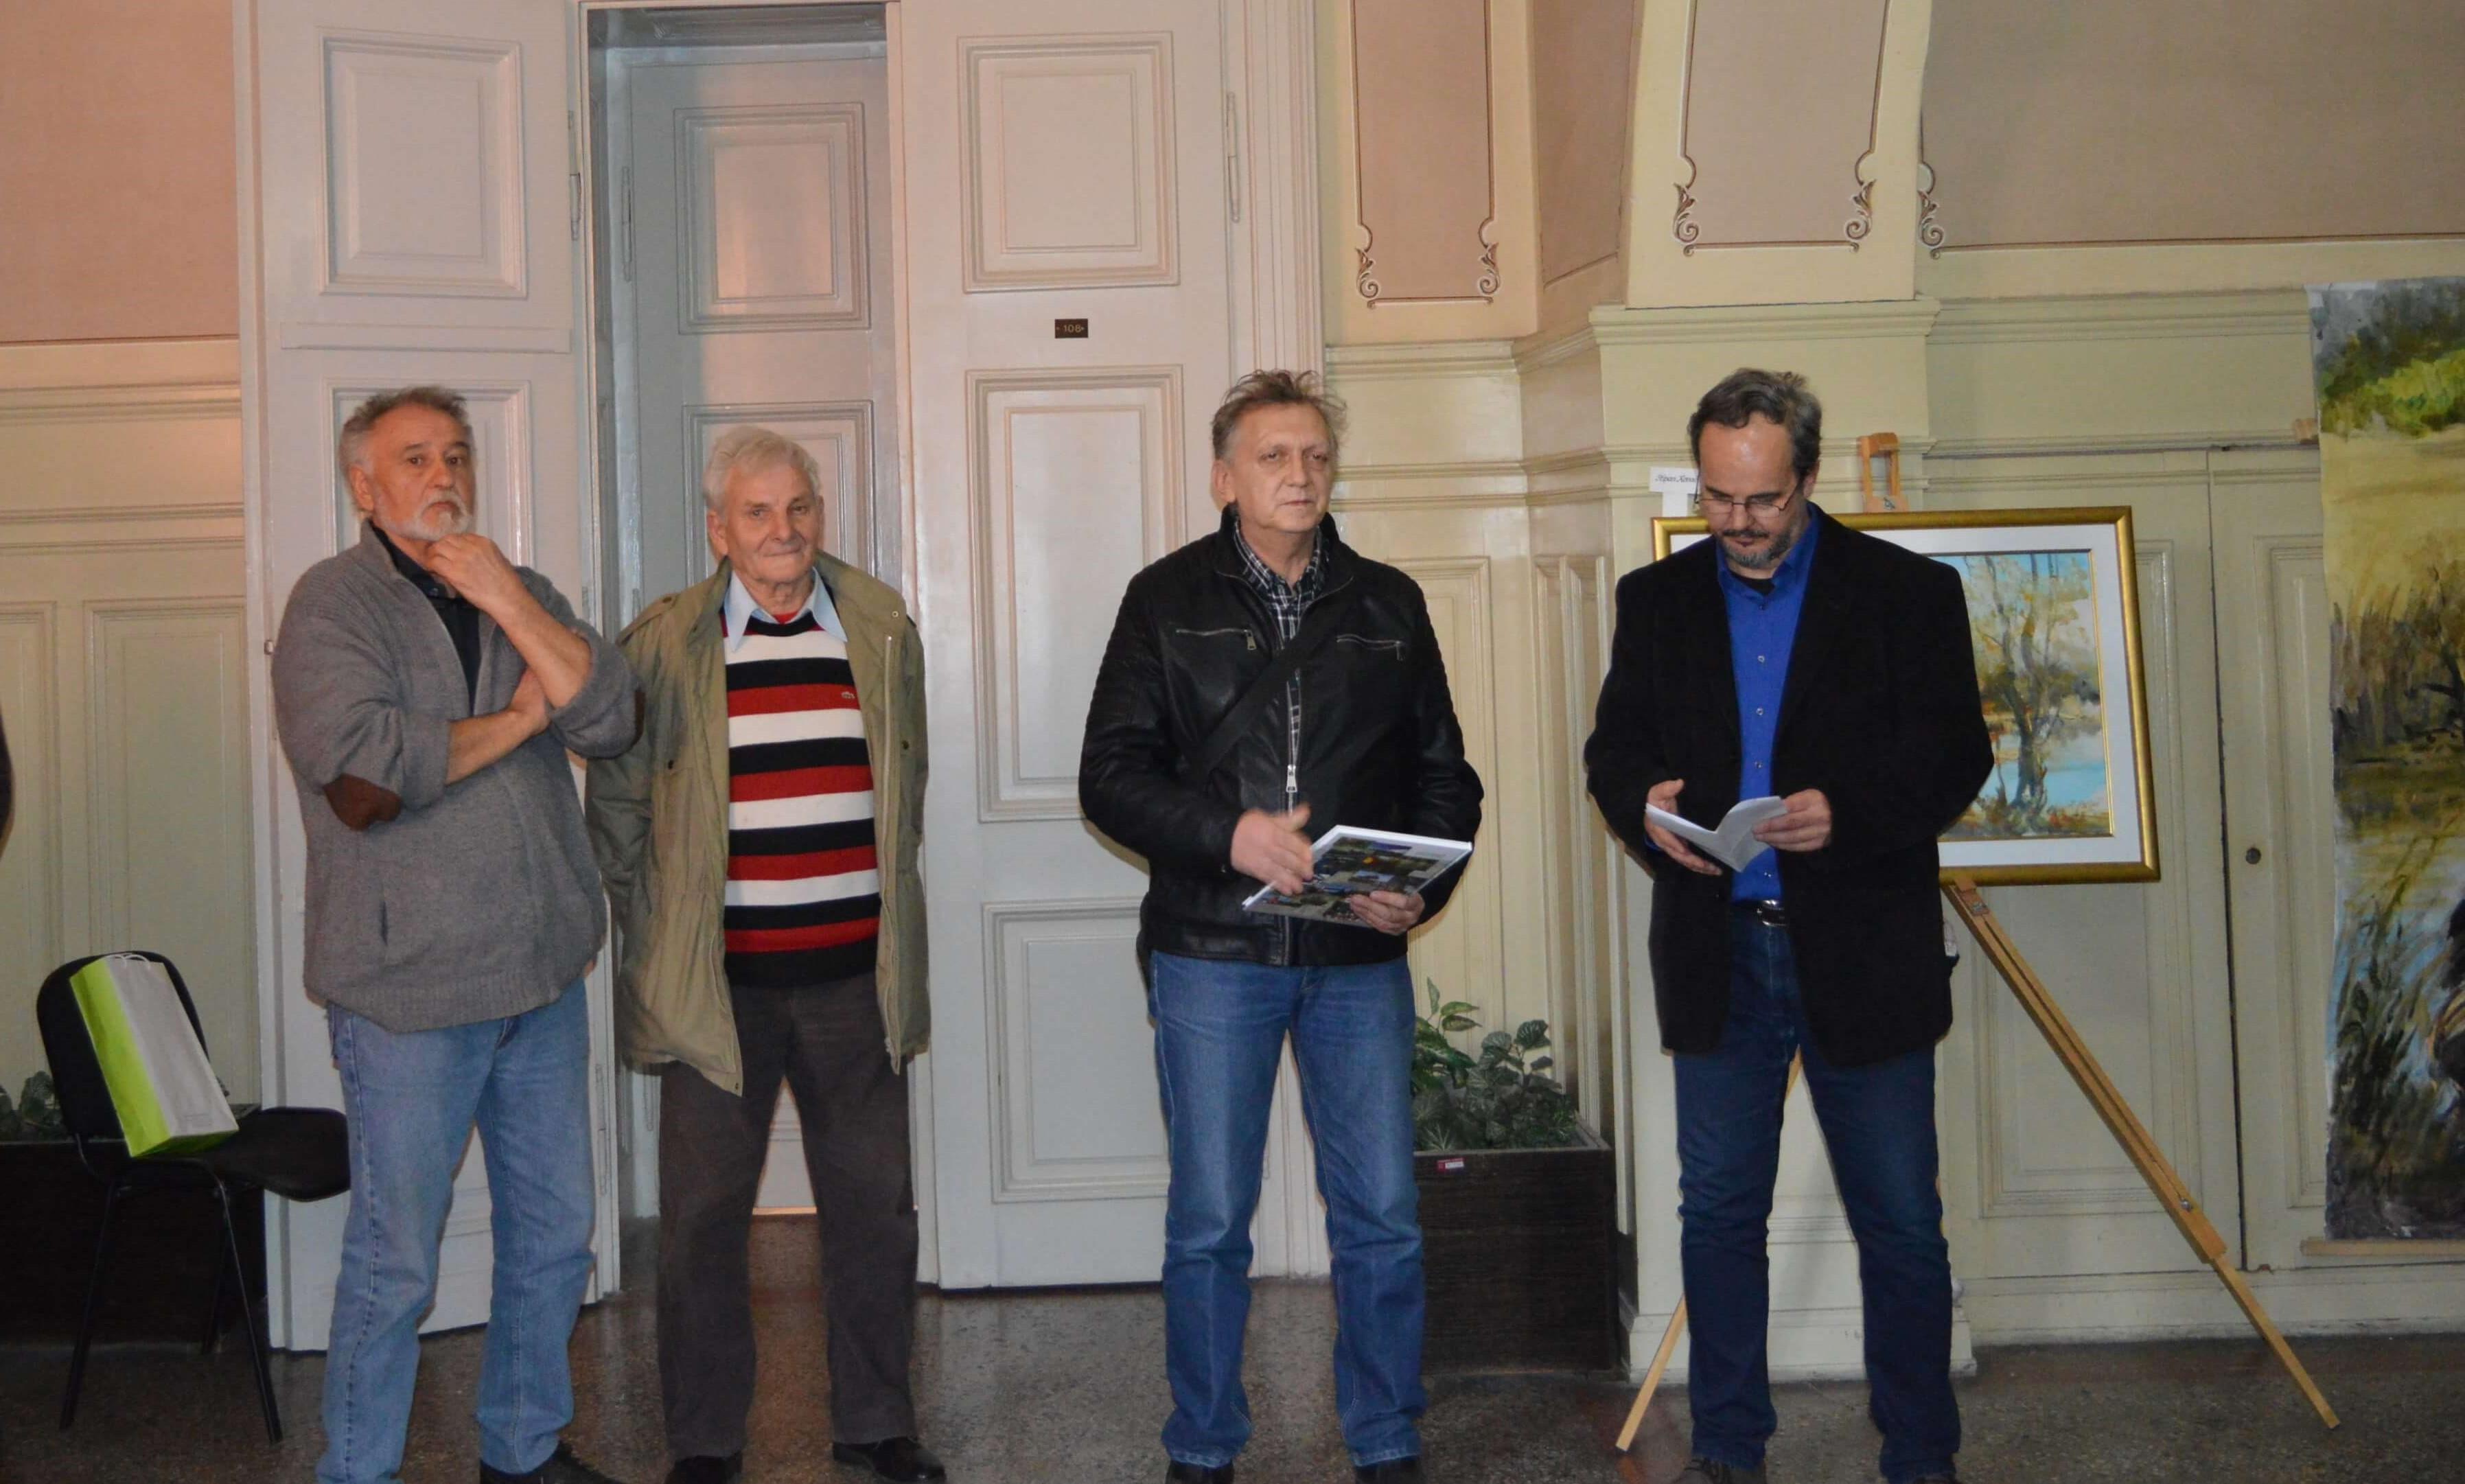 Сликари Стипан Ковач , Милорад Рађеновић и председник МЗ Бачки Моноштор Стипан Бенић